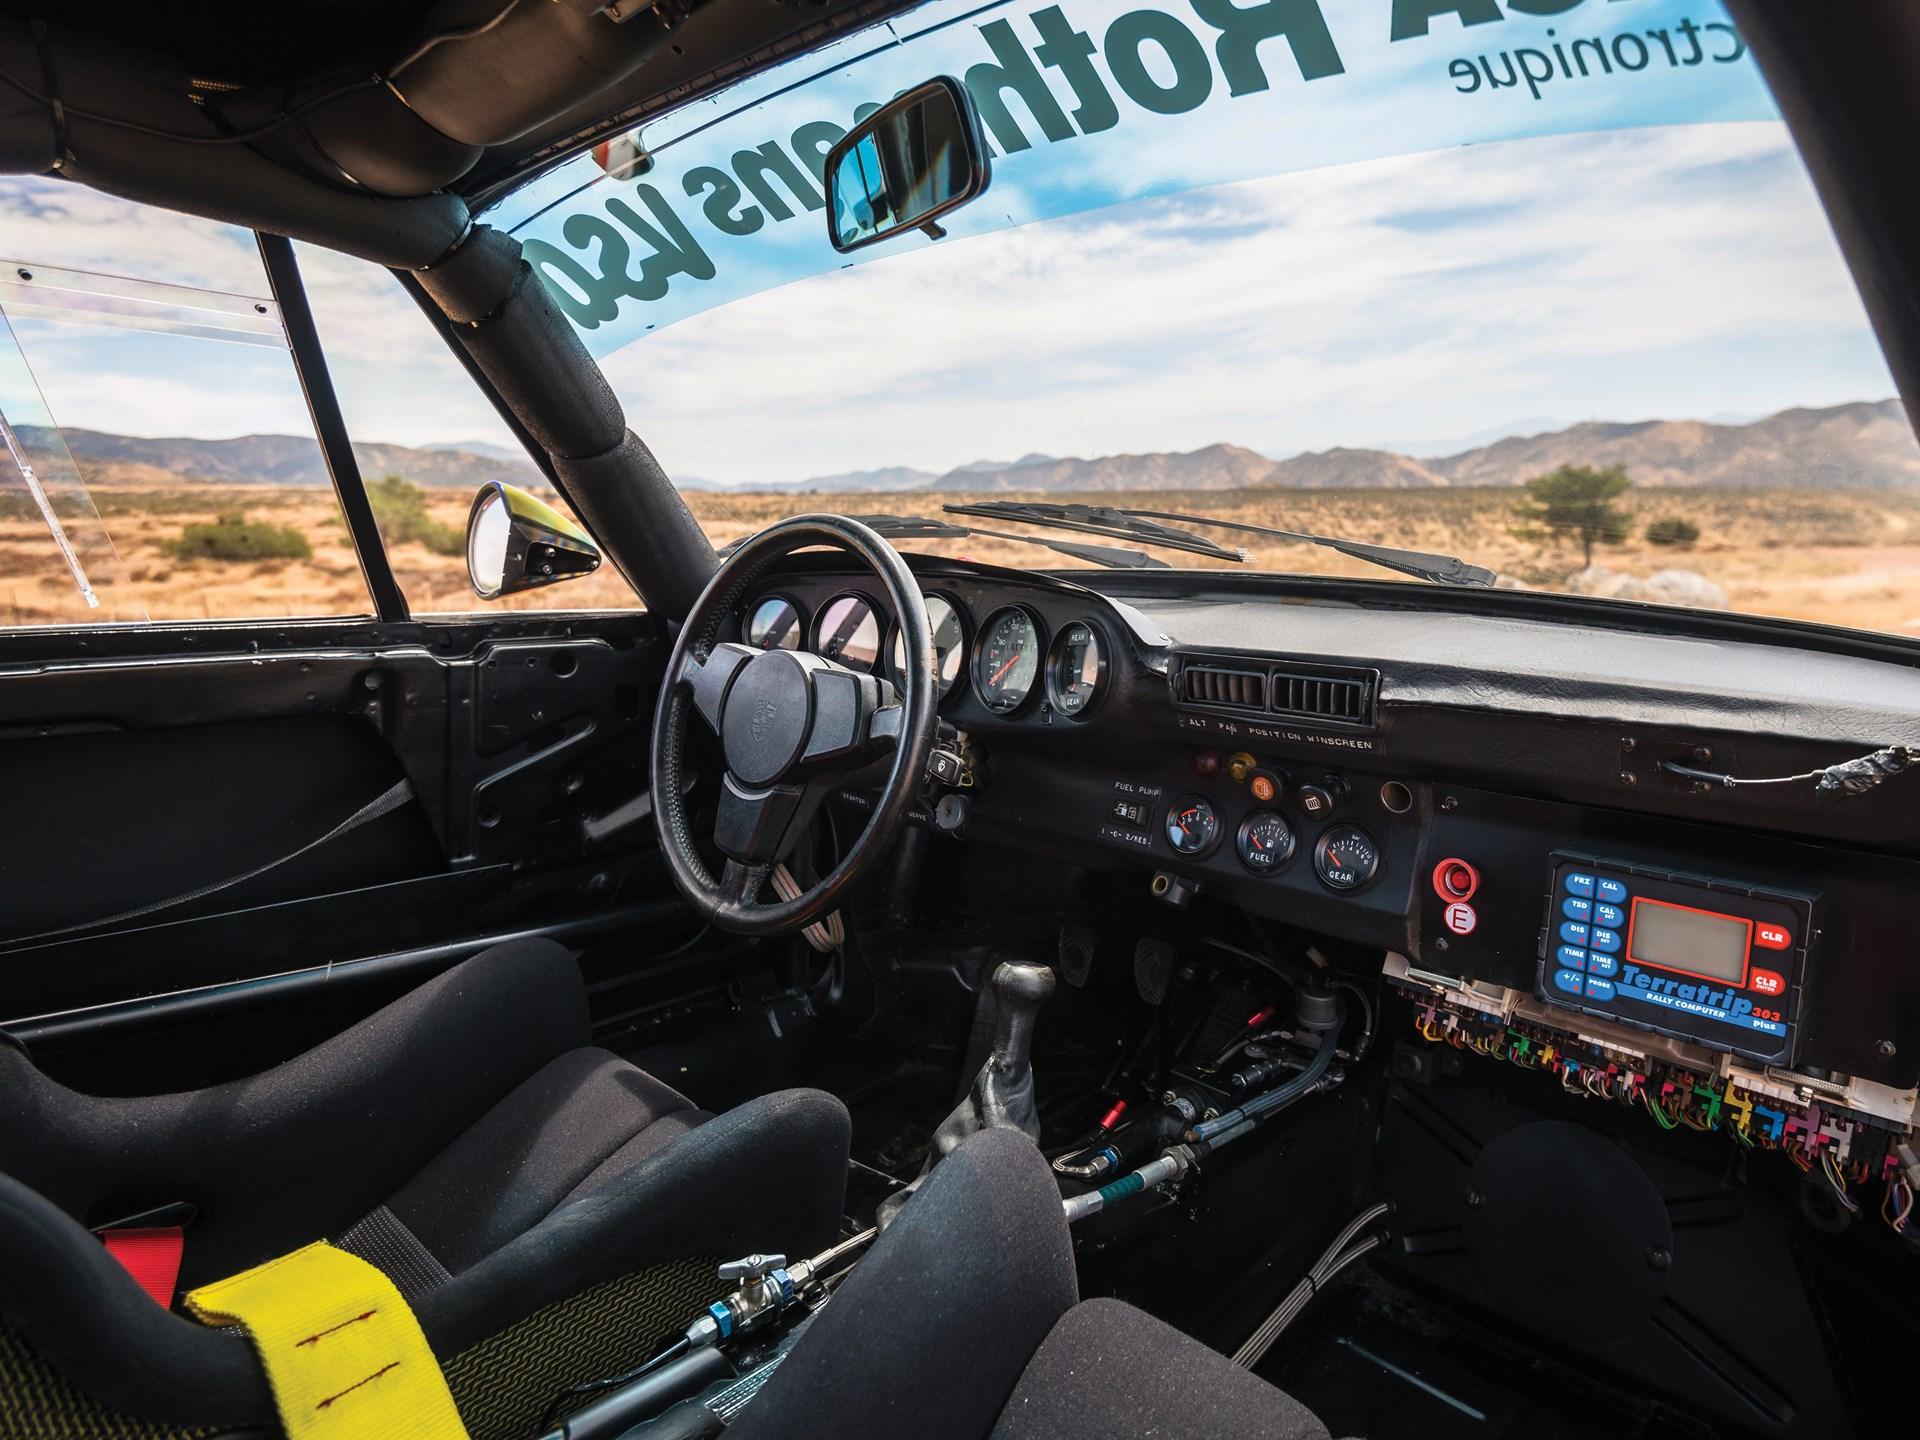 1985 Porsche 959 Paris-Dakar interior